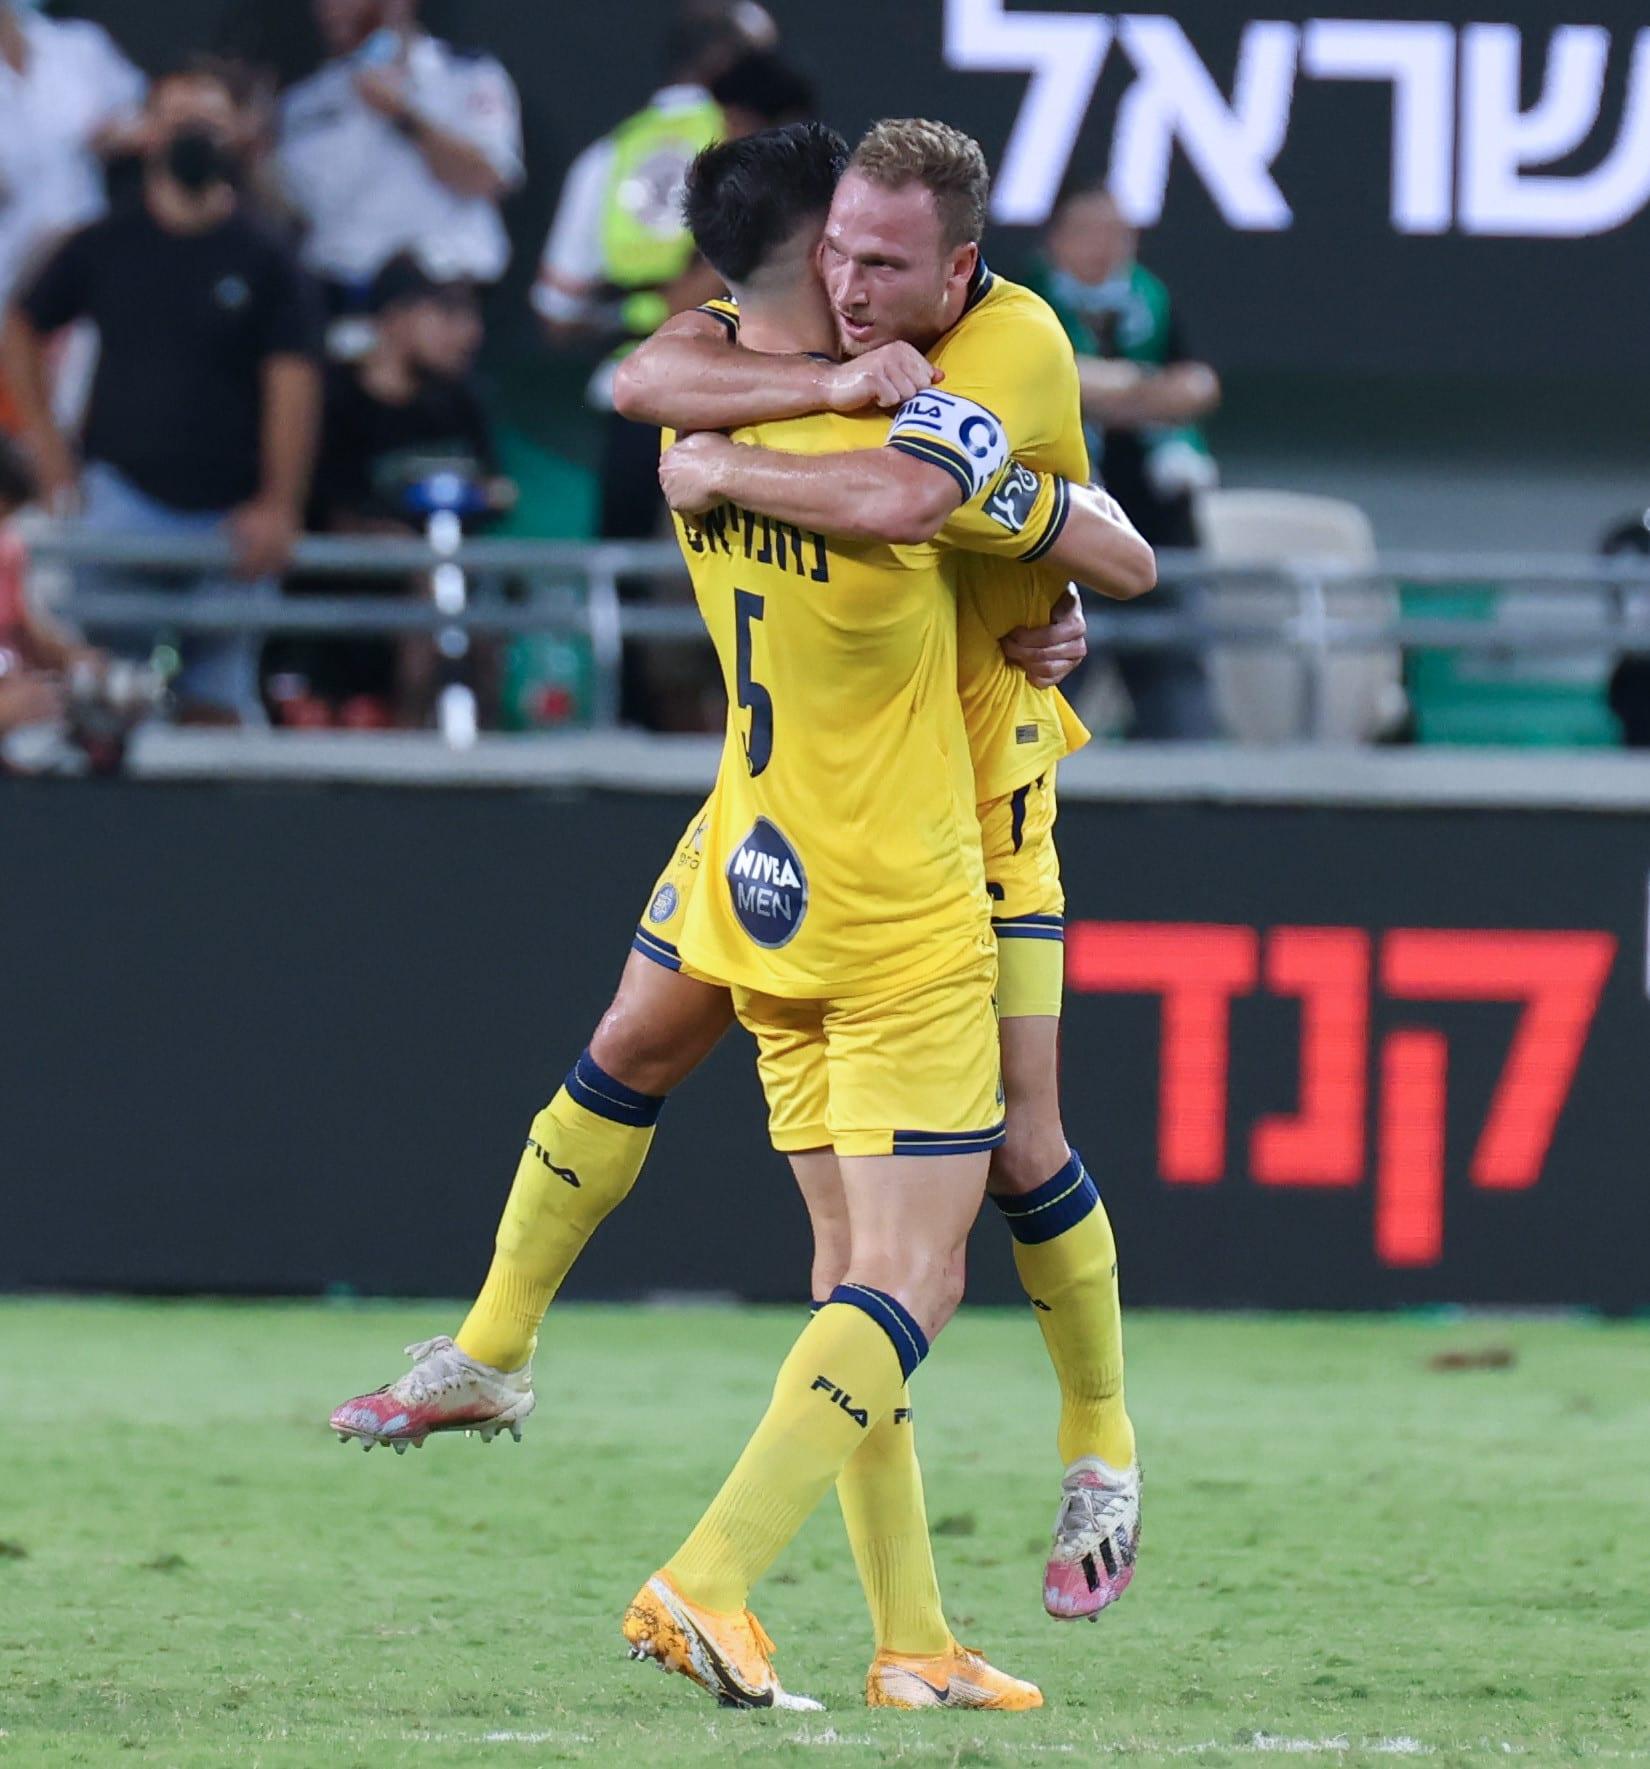 Jugadores del Maccabi Tel Aviv, Dan Glazer, Idan Nachmias